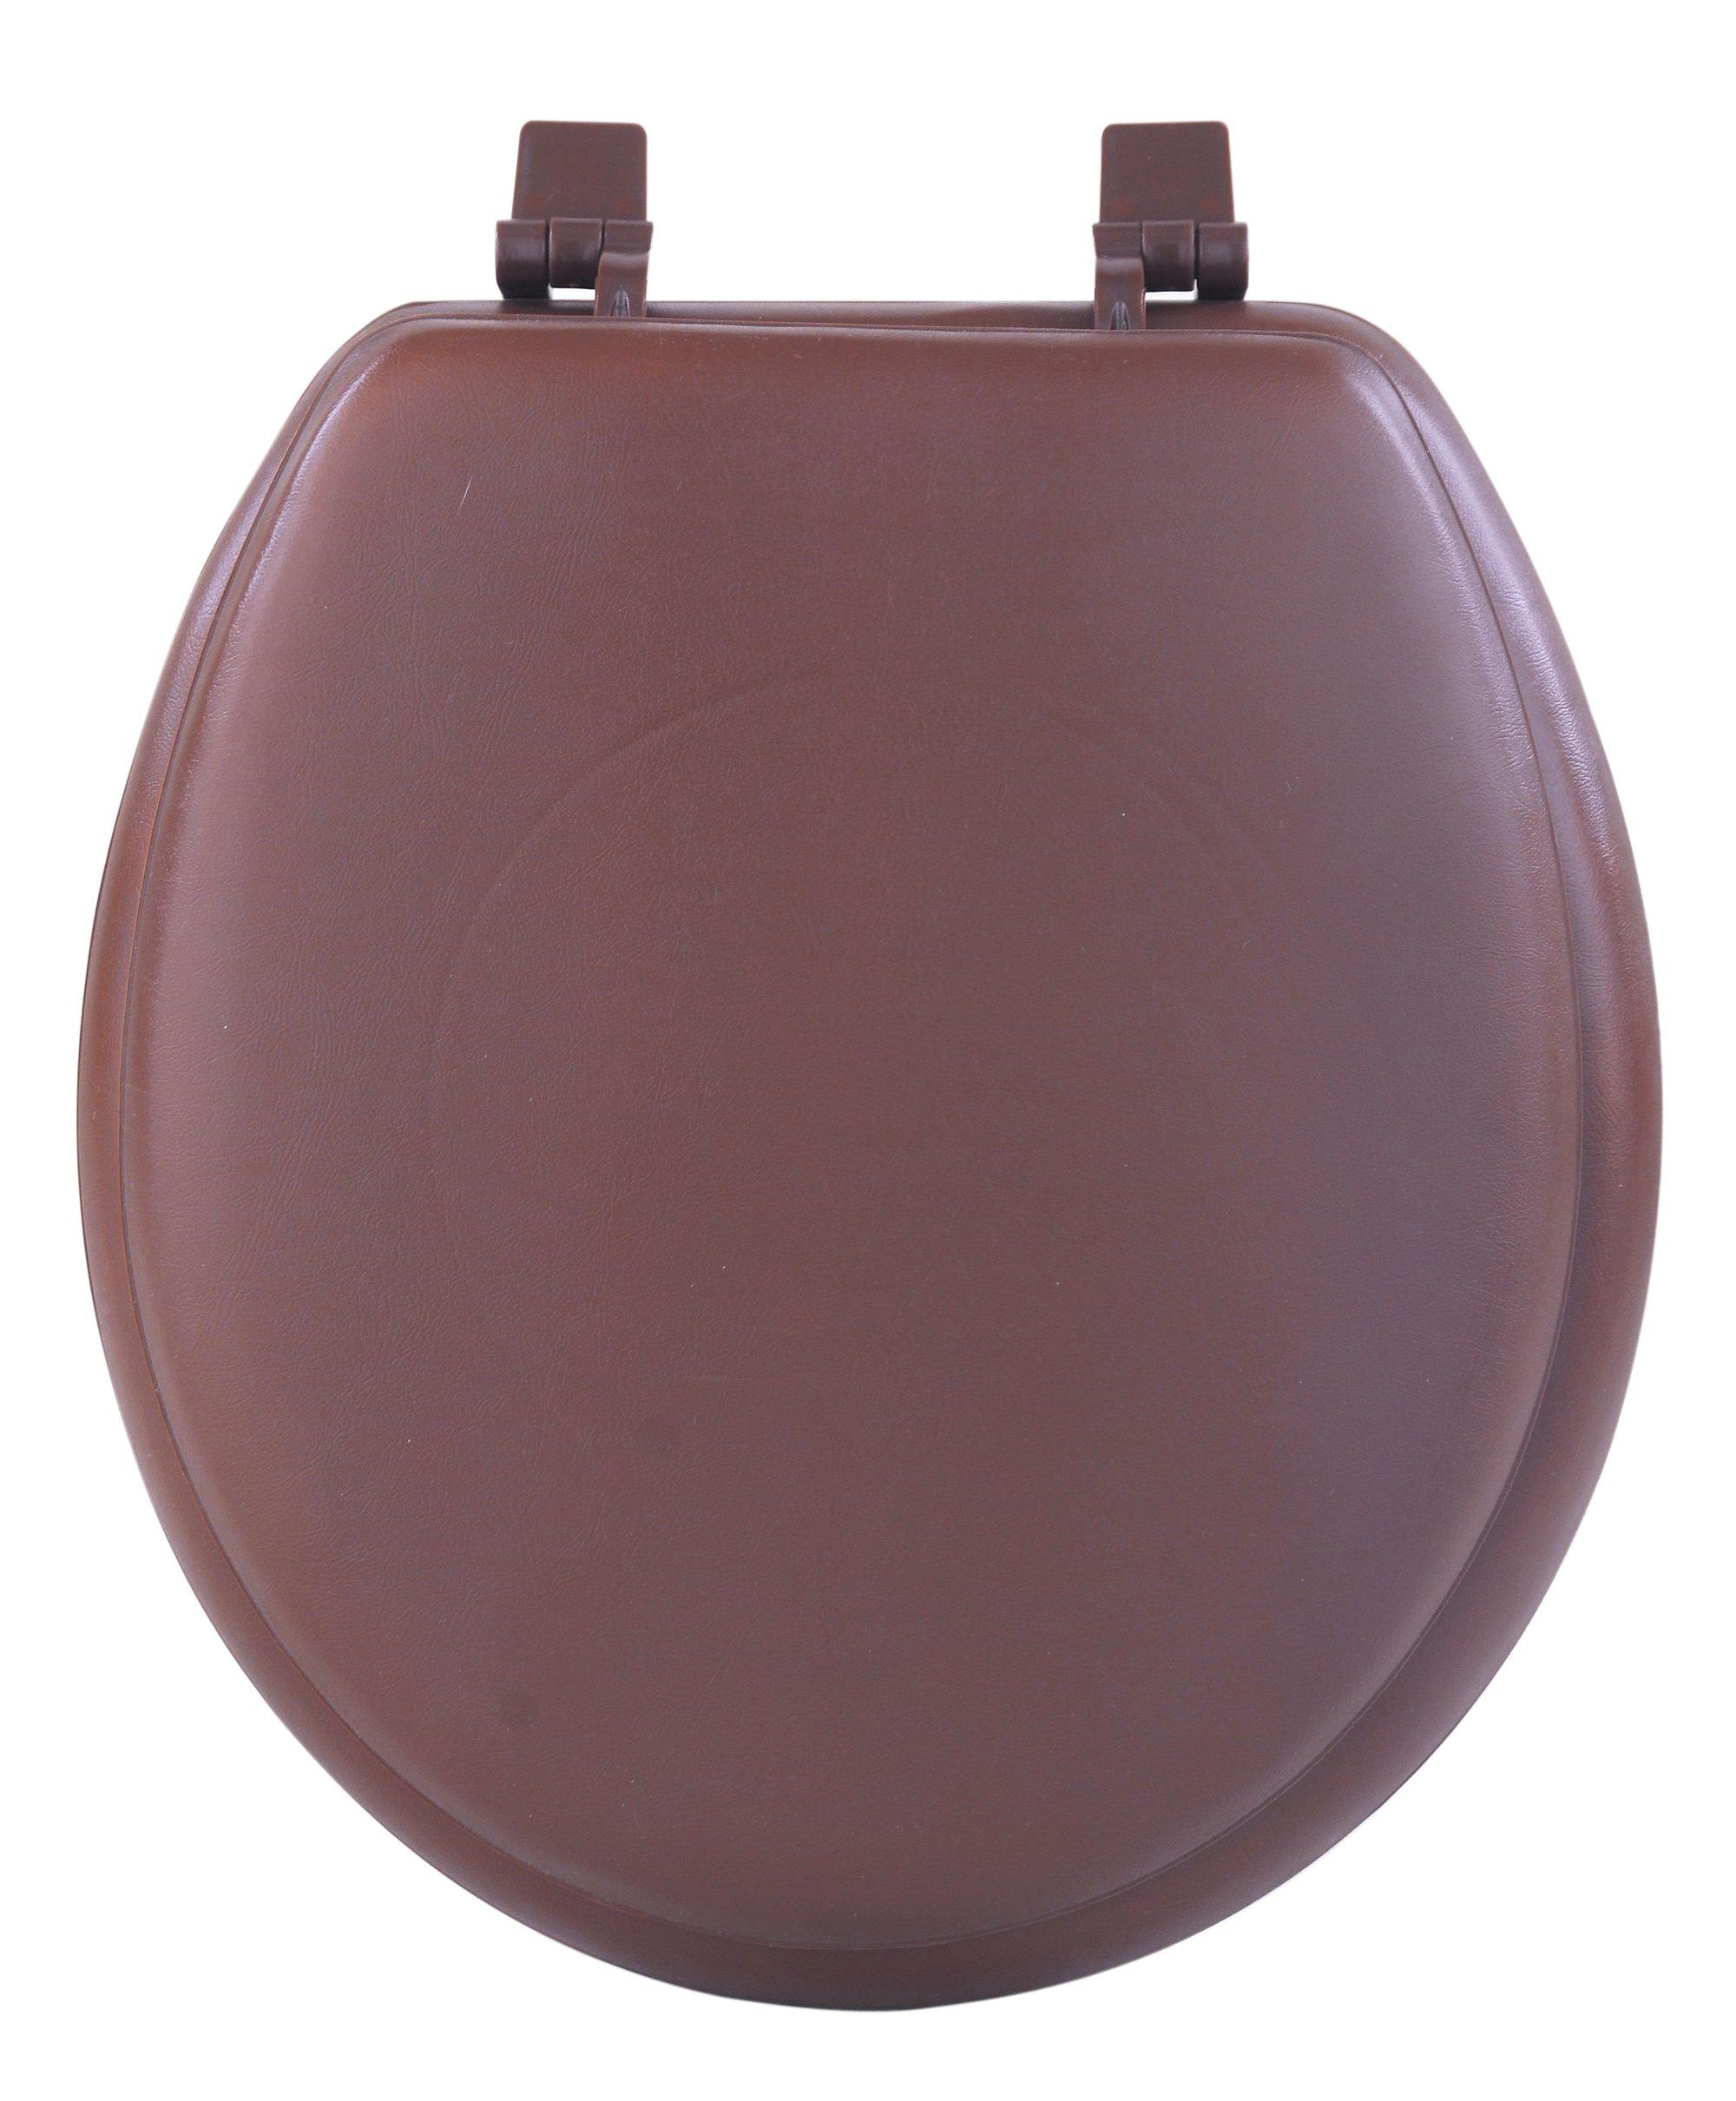 Achim Home Furnishings TOVYSTCH04 17-Inch Fantasia Standard Toilet Seat, Soft Chocolate